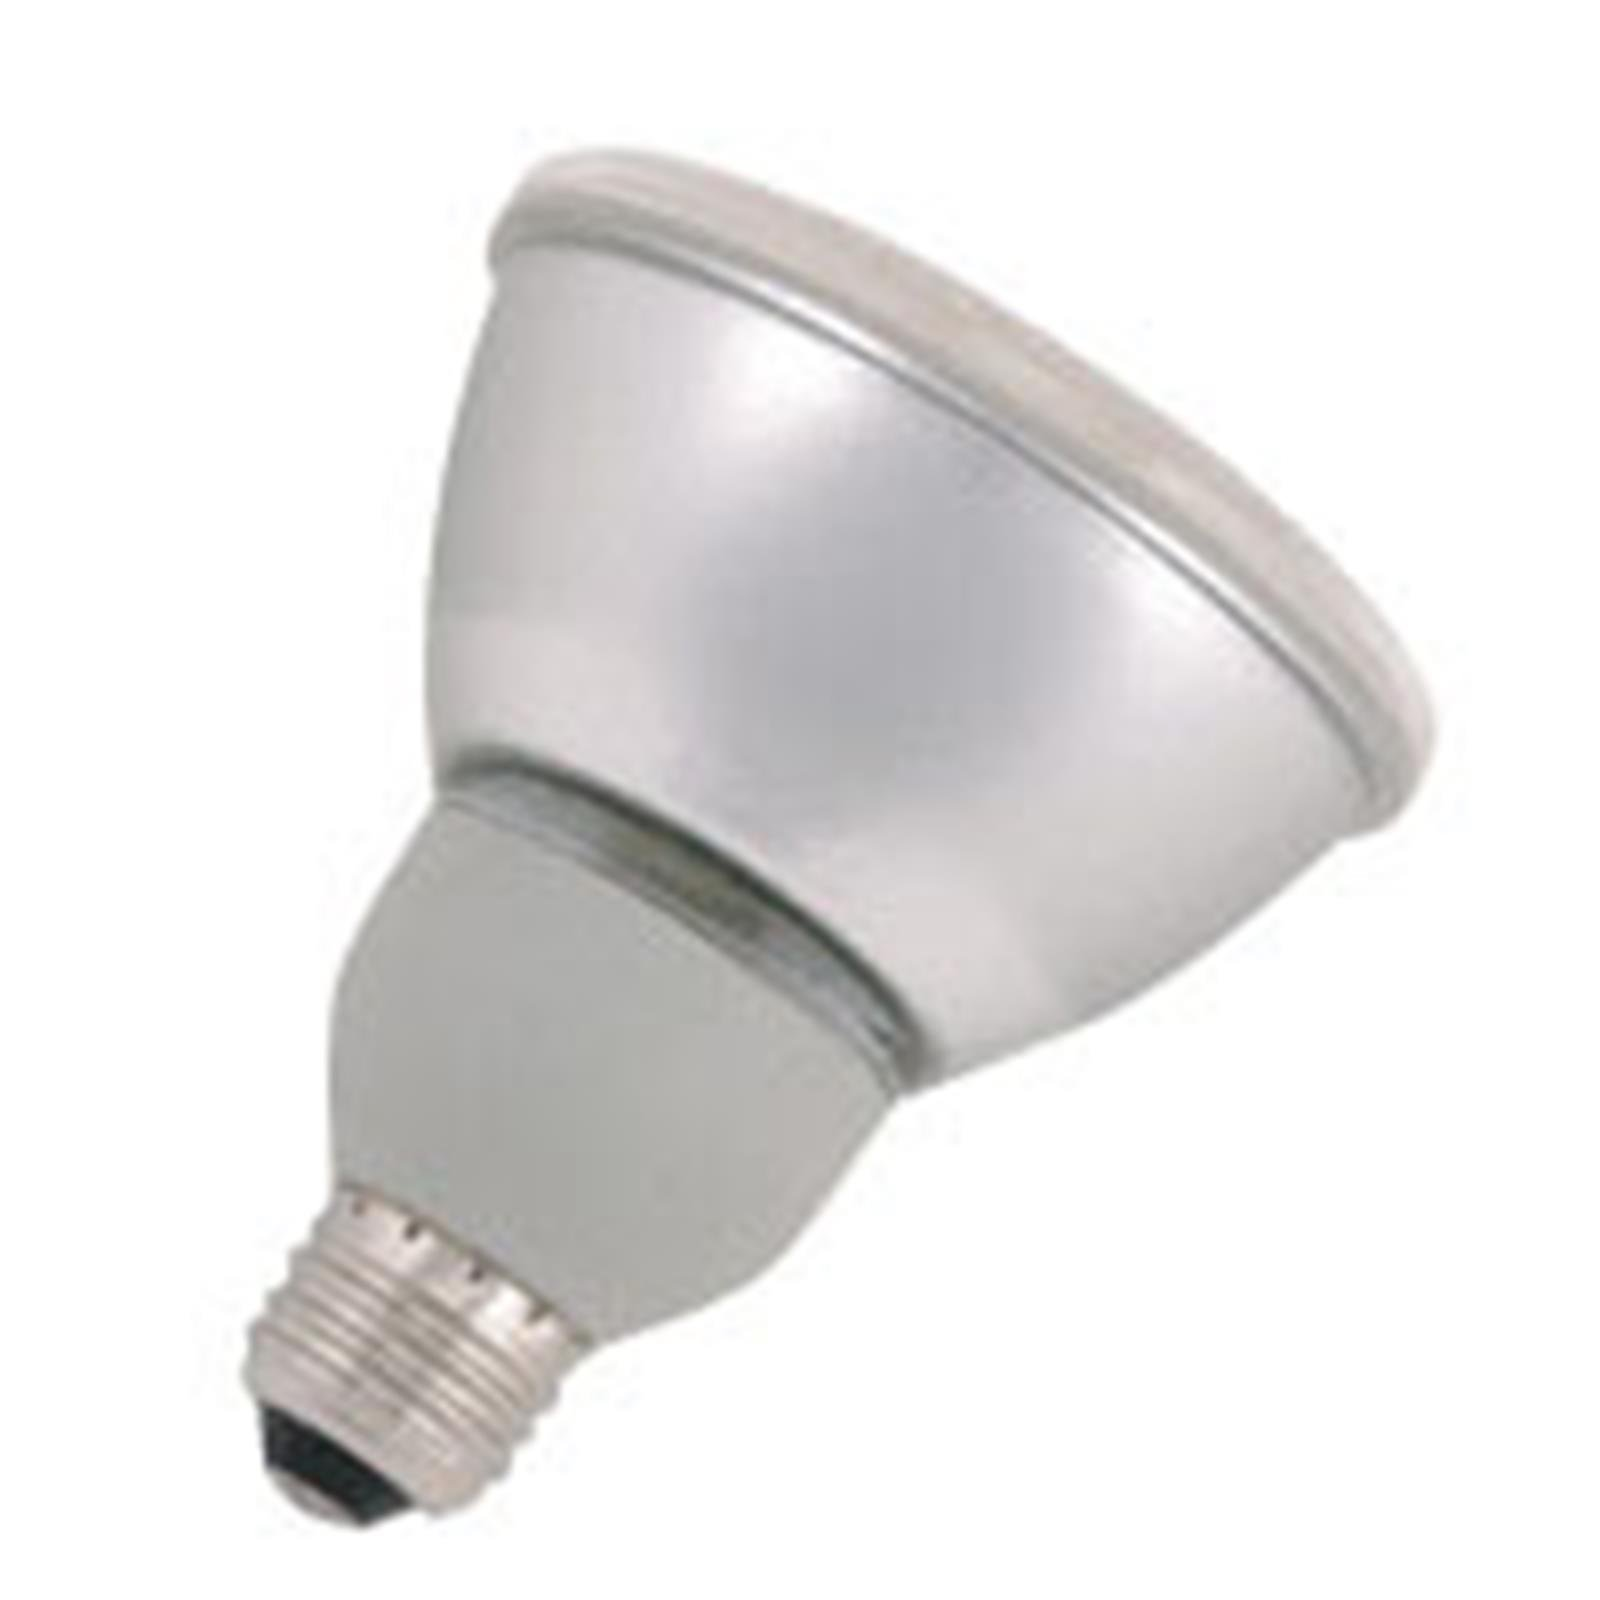 24 Qty. Halco 15W PAR30 3500K Med ProLume CFL15/35/PAR30 15w 120v CFL White Flood Lamp Bulb